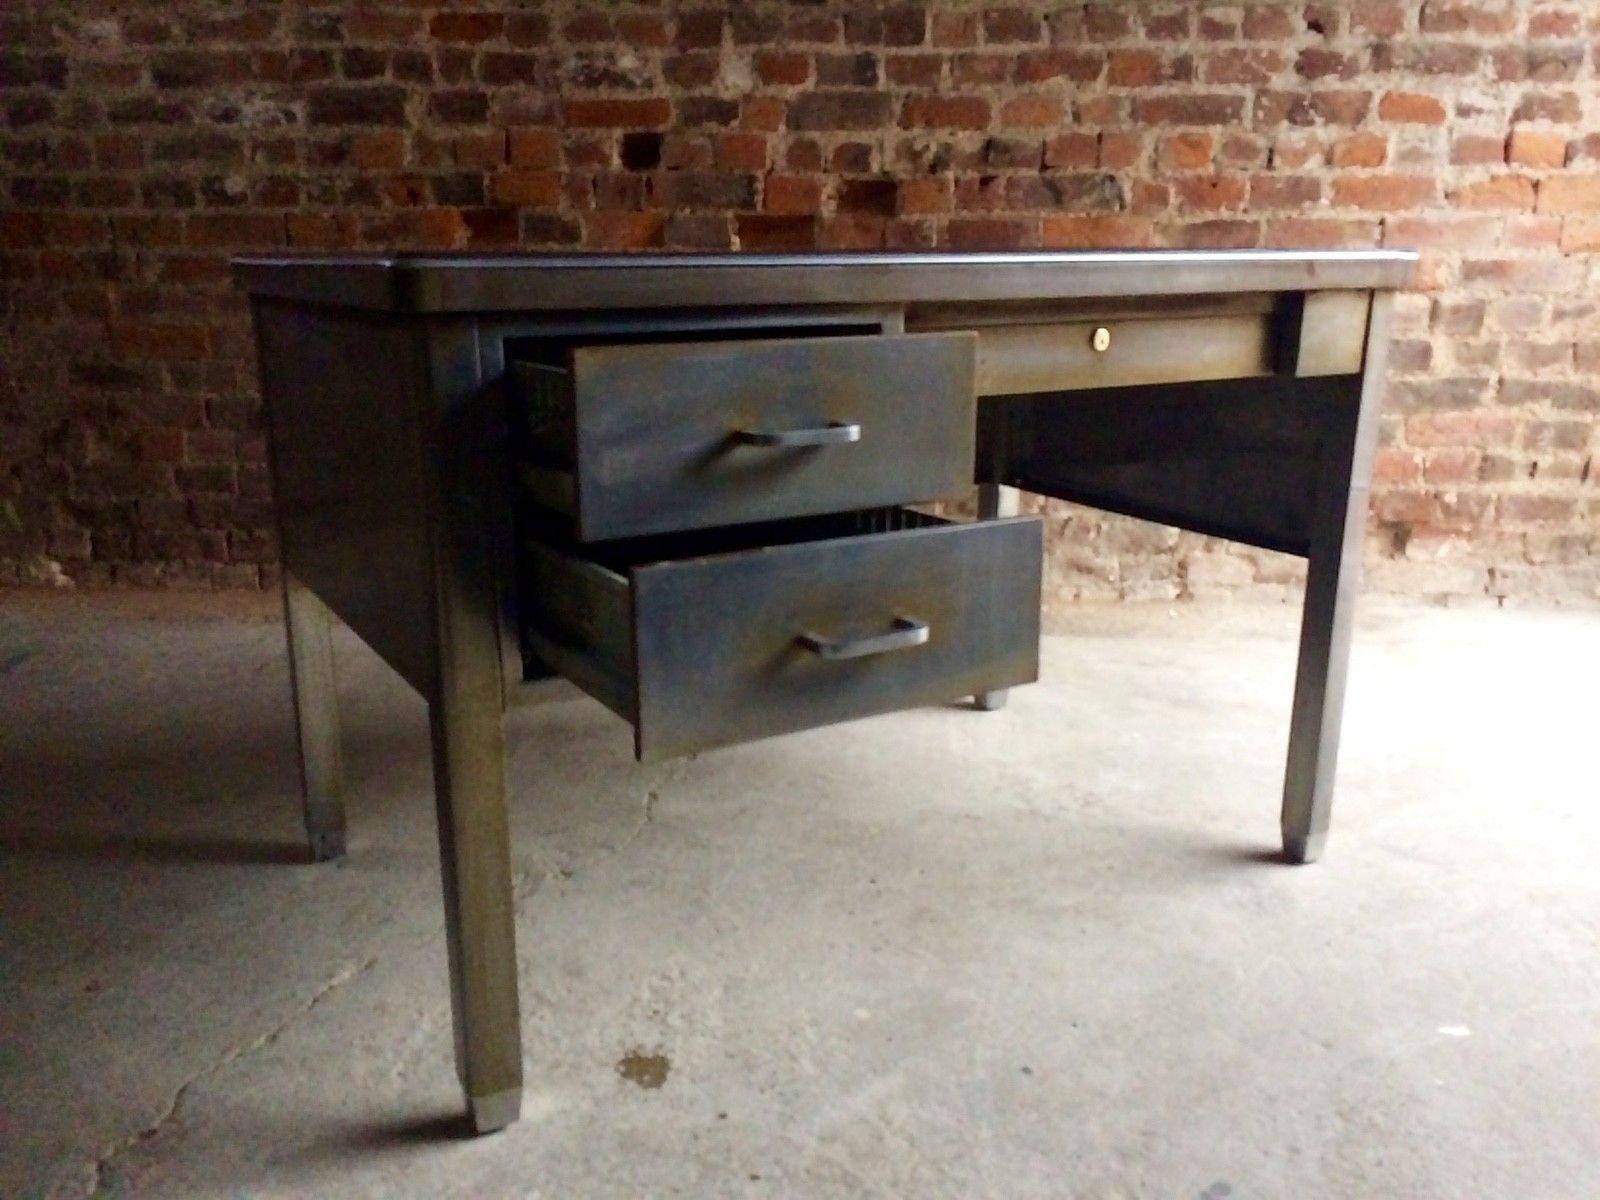 vintage steel furniture. Vintage Steel Industrial Writing Desk From Robberechts 12. $1,972.00. Price Per Piece Furniture